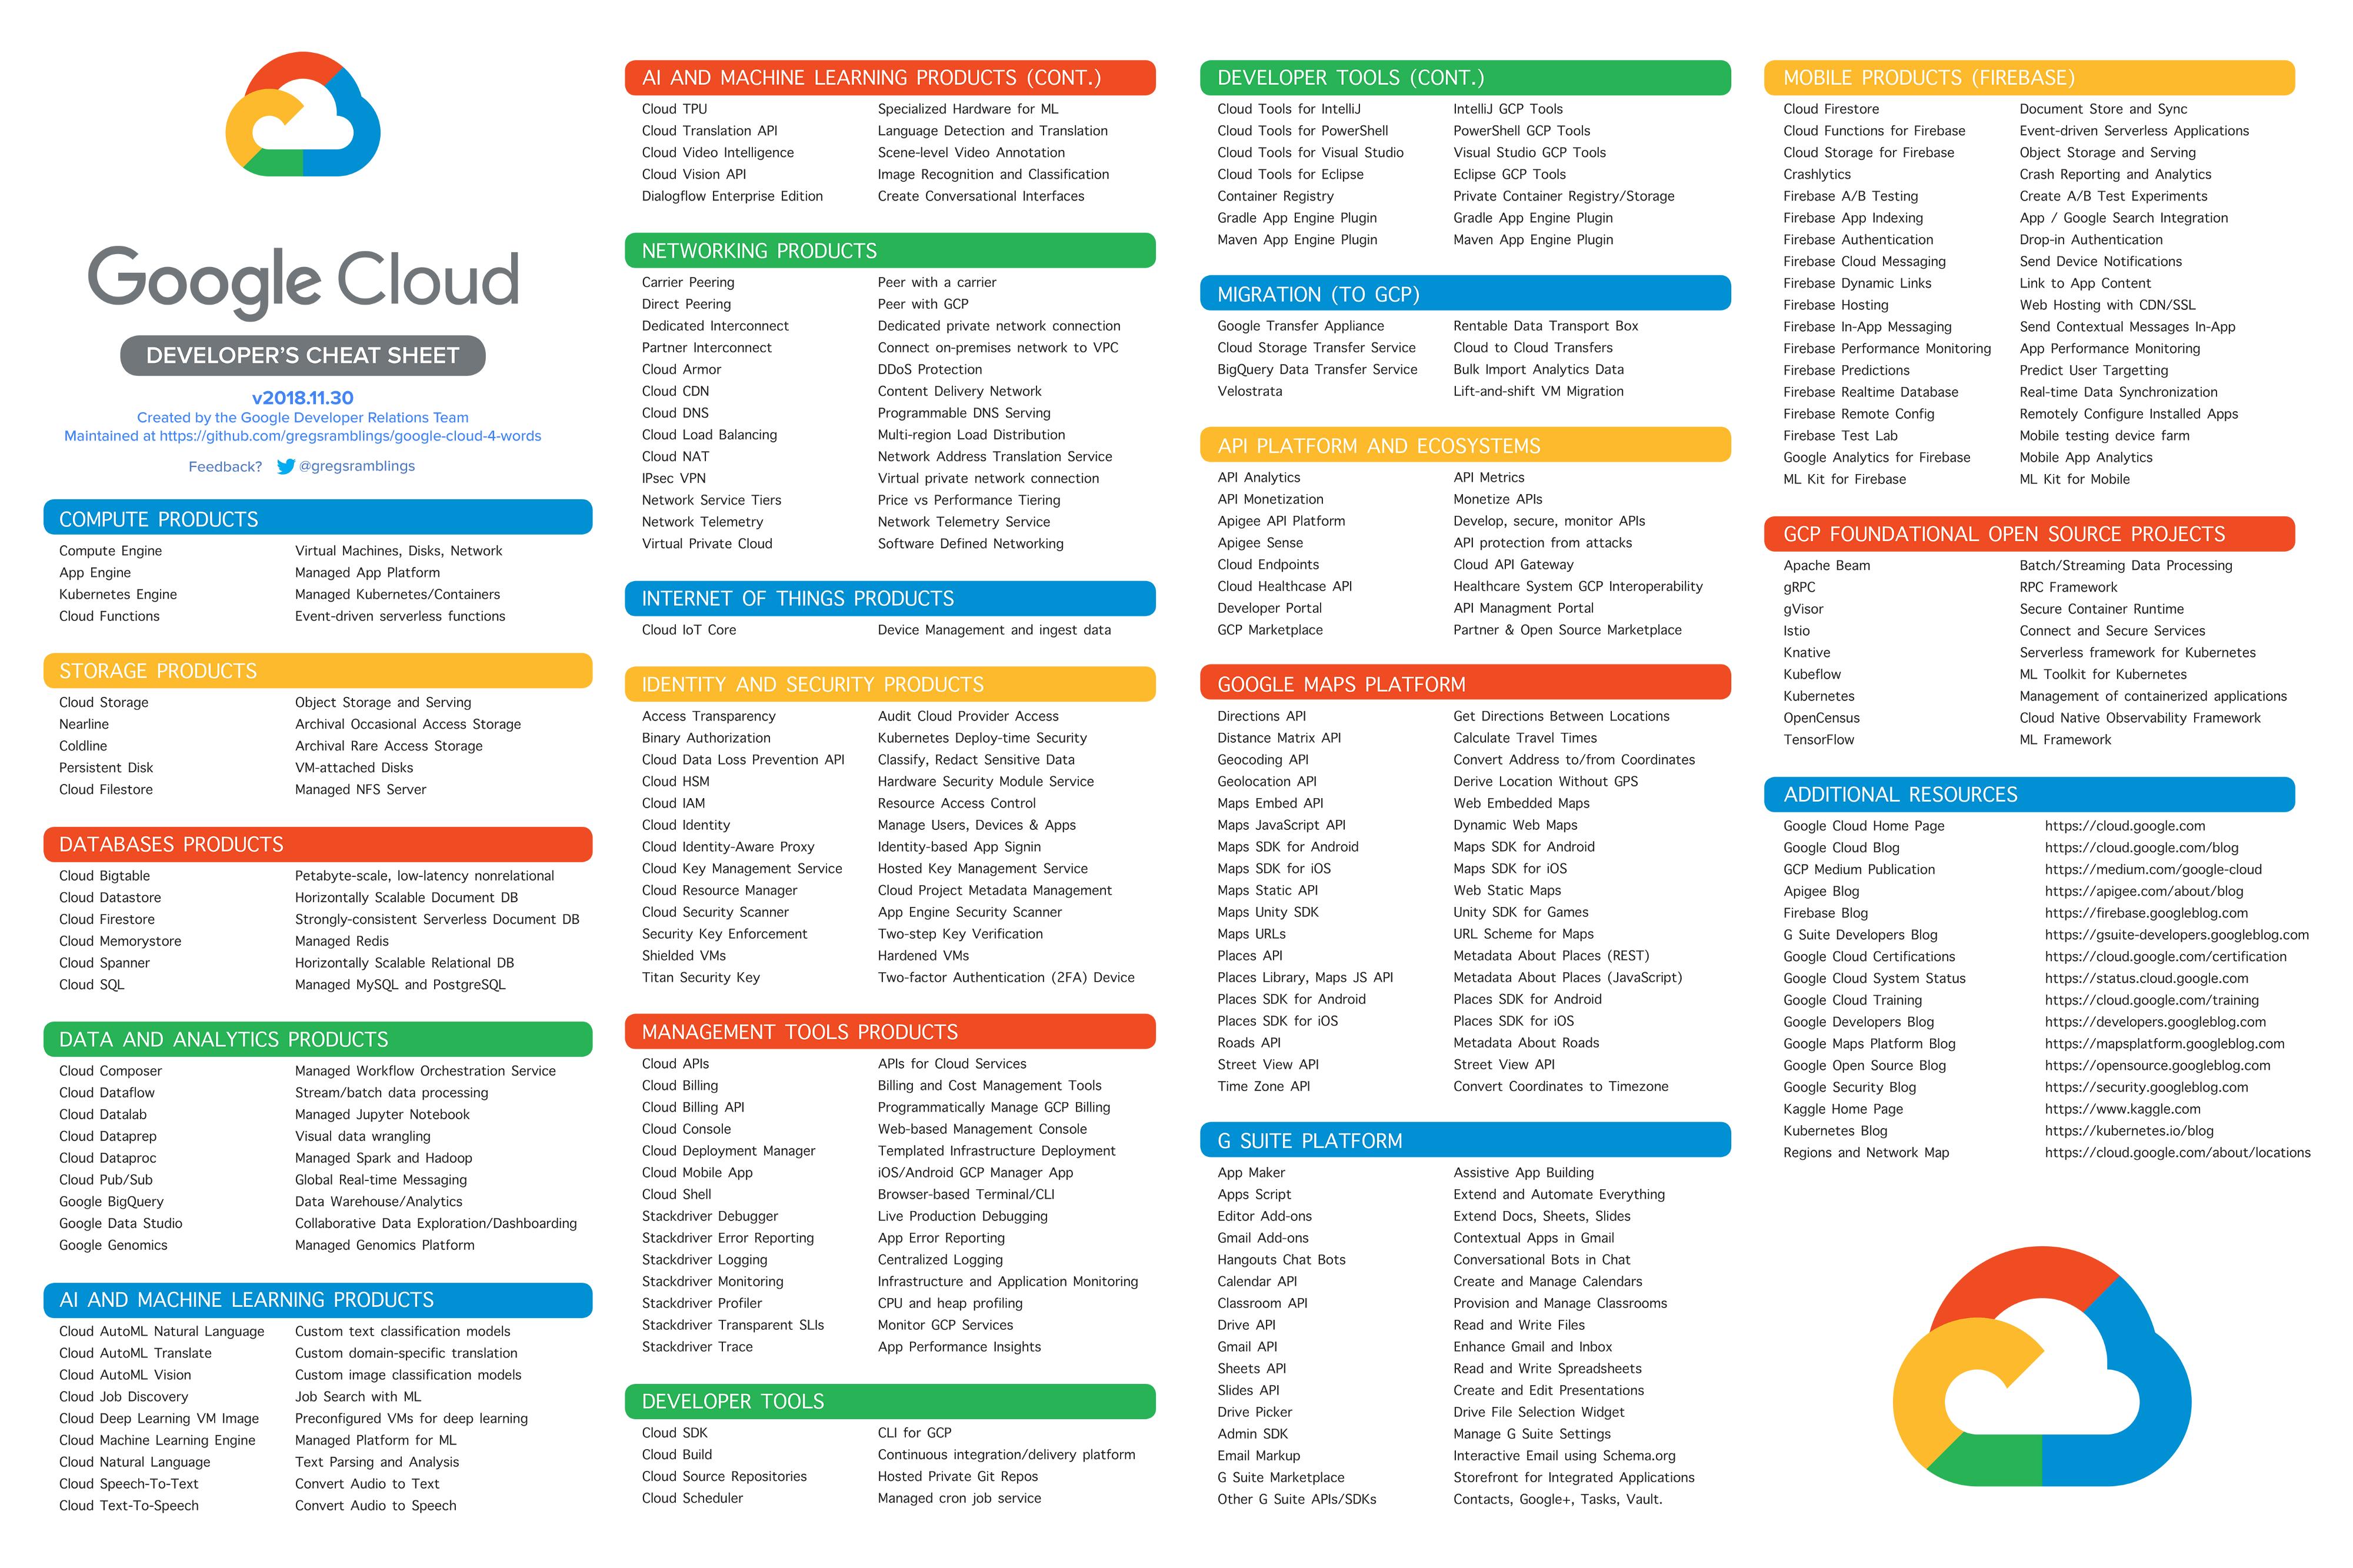 Google Cloud Family